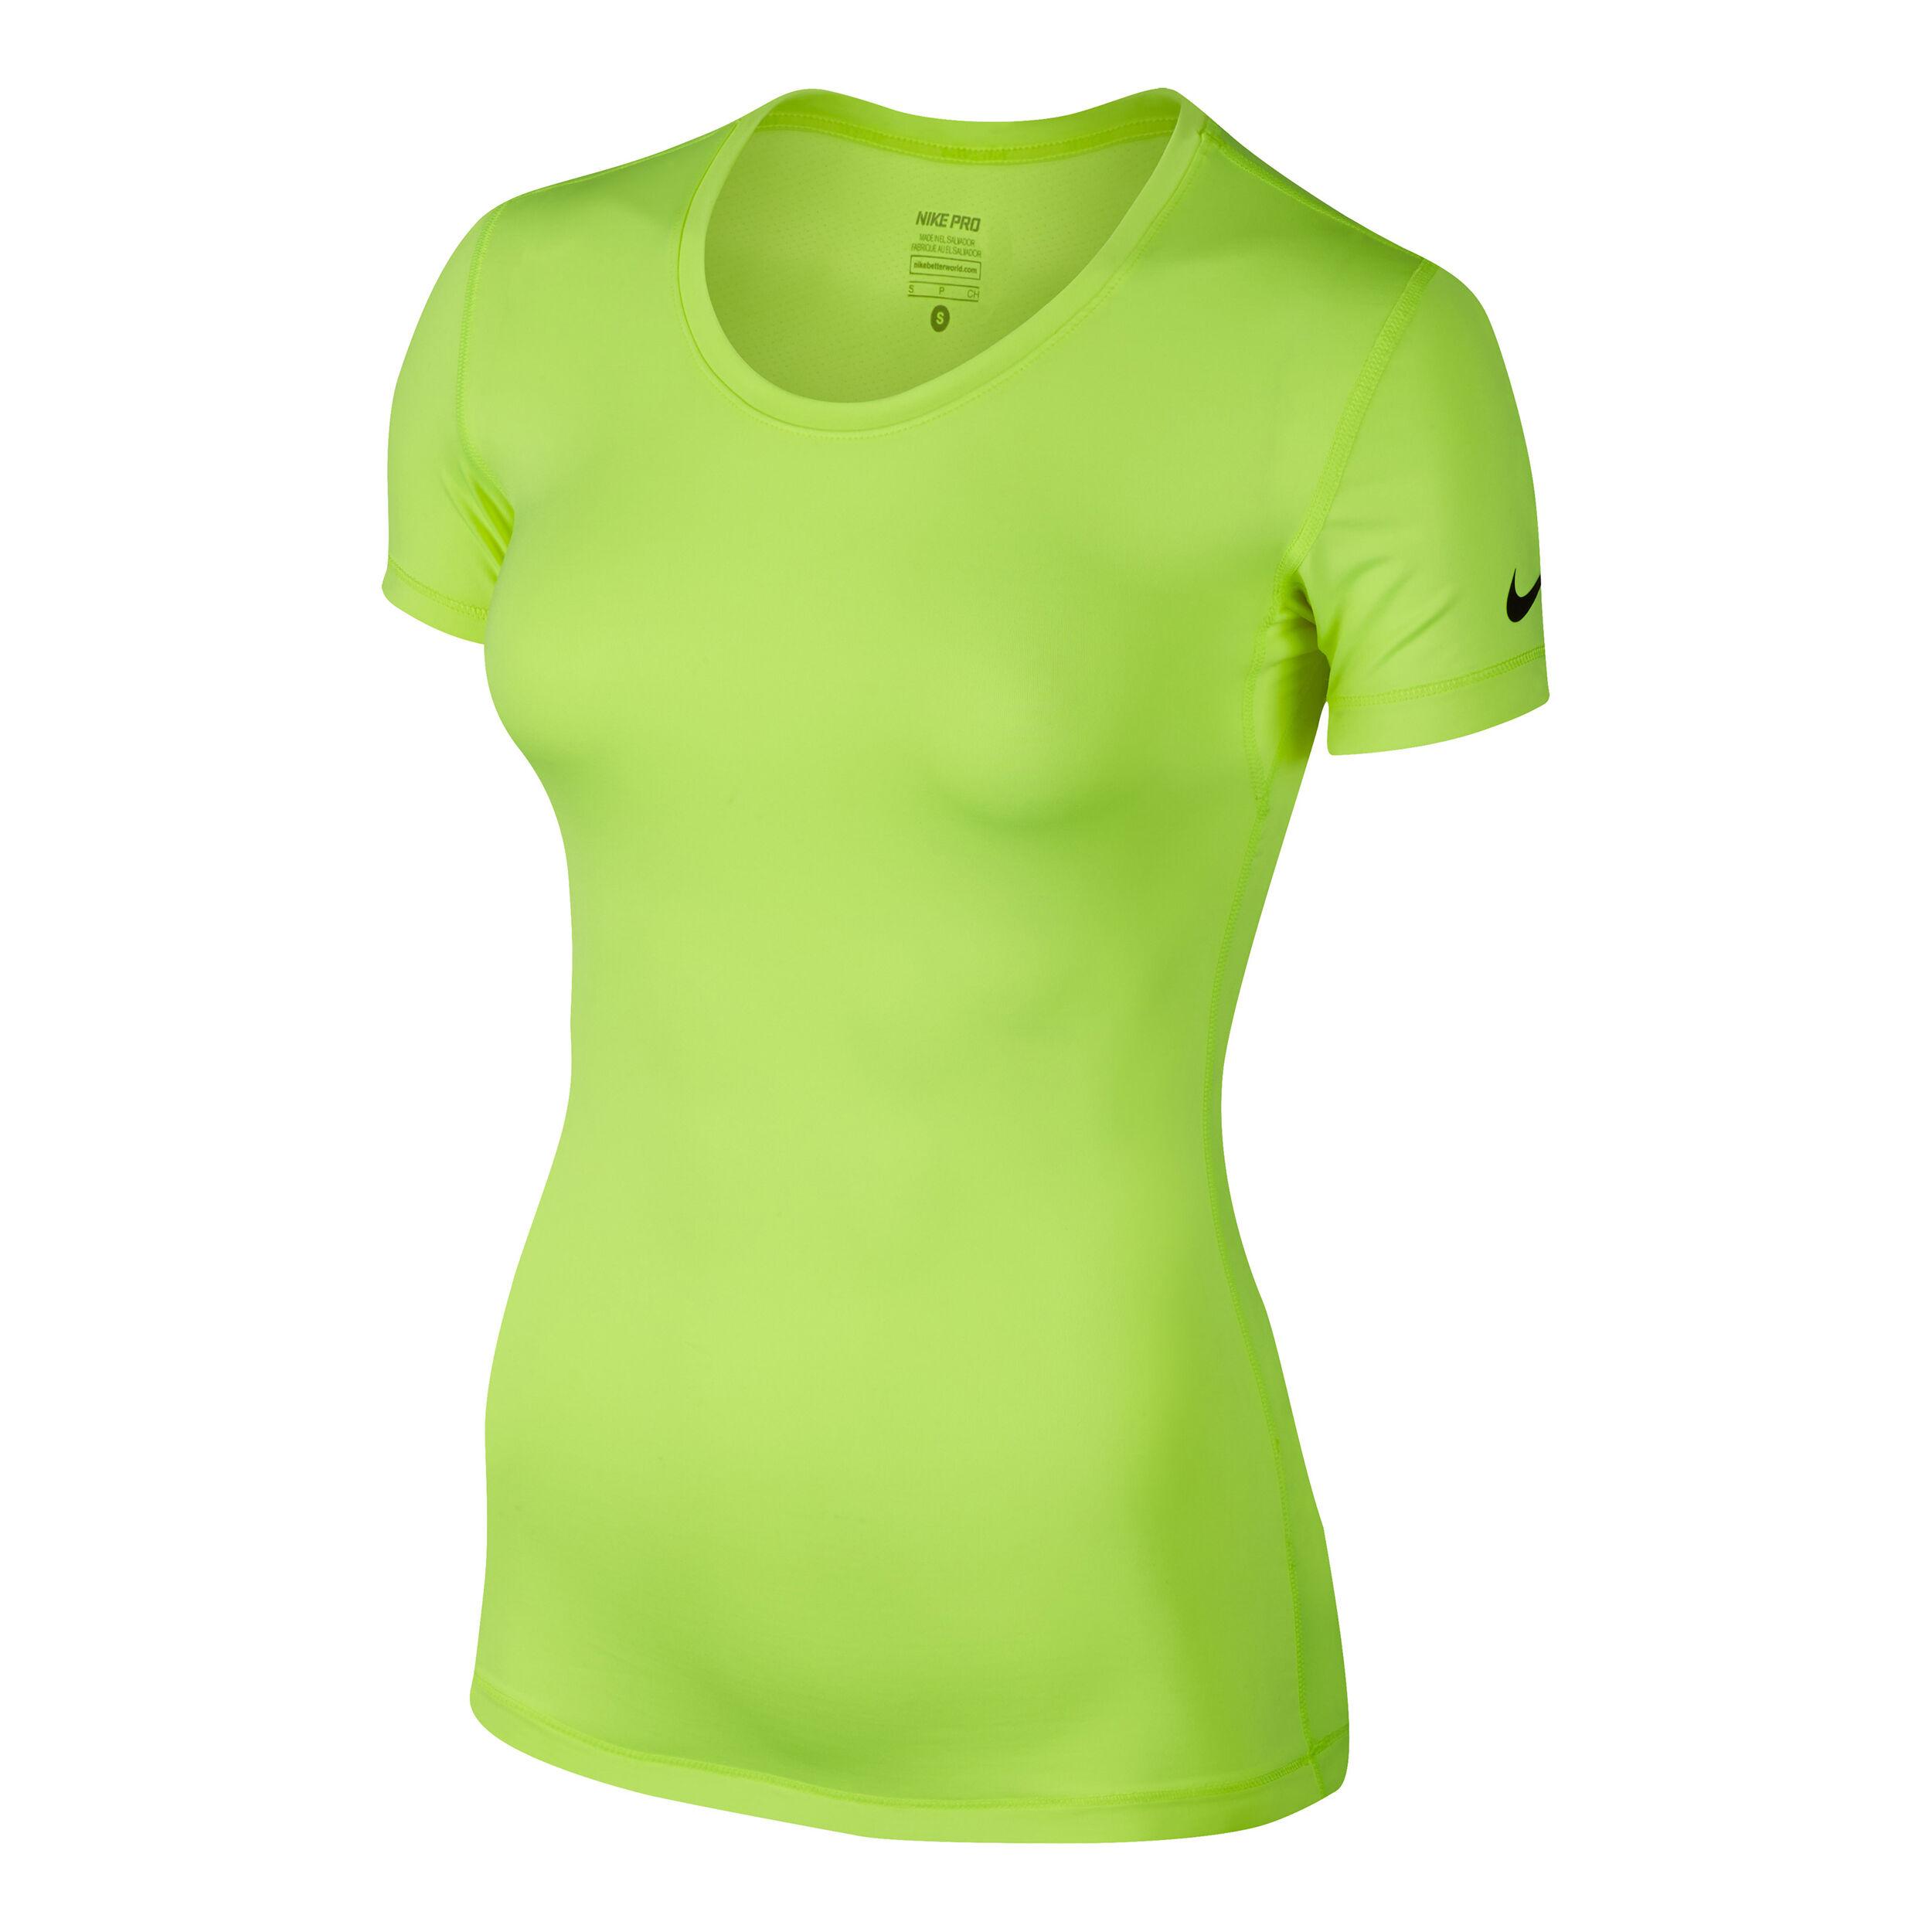 Nike Pro Cool T Shirt Damen Neongelb, Schwarz online